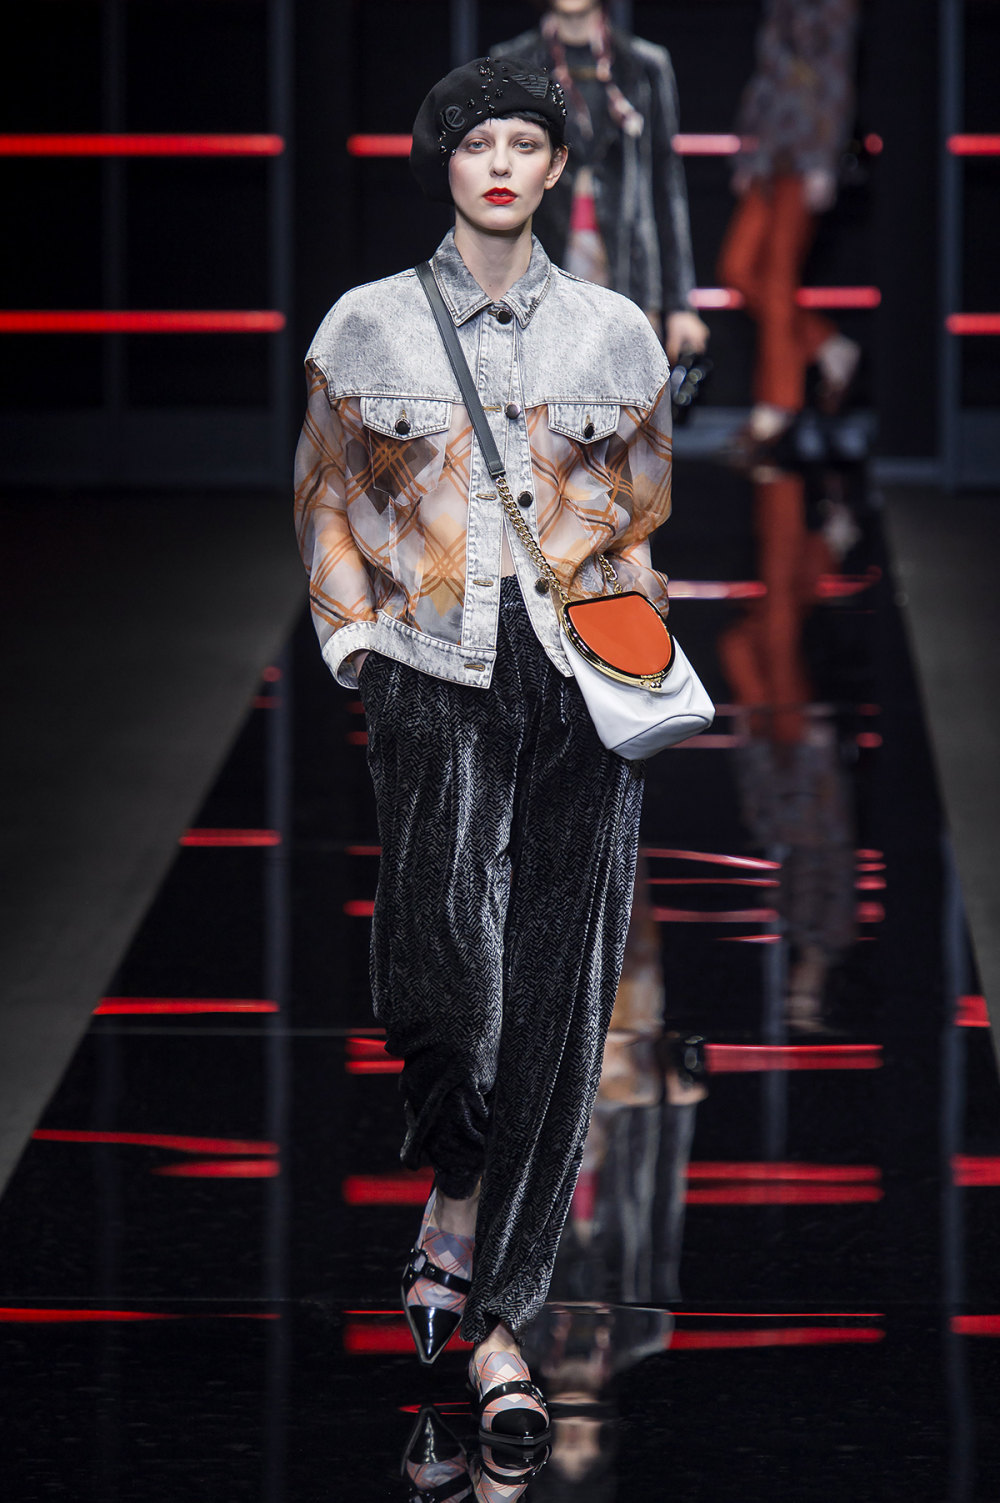 Emporio Armani时装系列畅的裤子带有柔滑裙子的鸡尾酒礼服-12.jpg